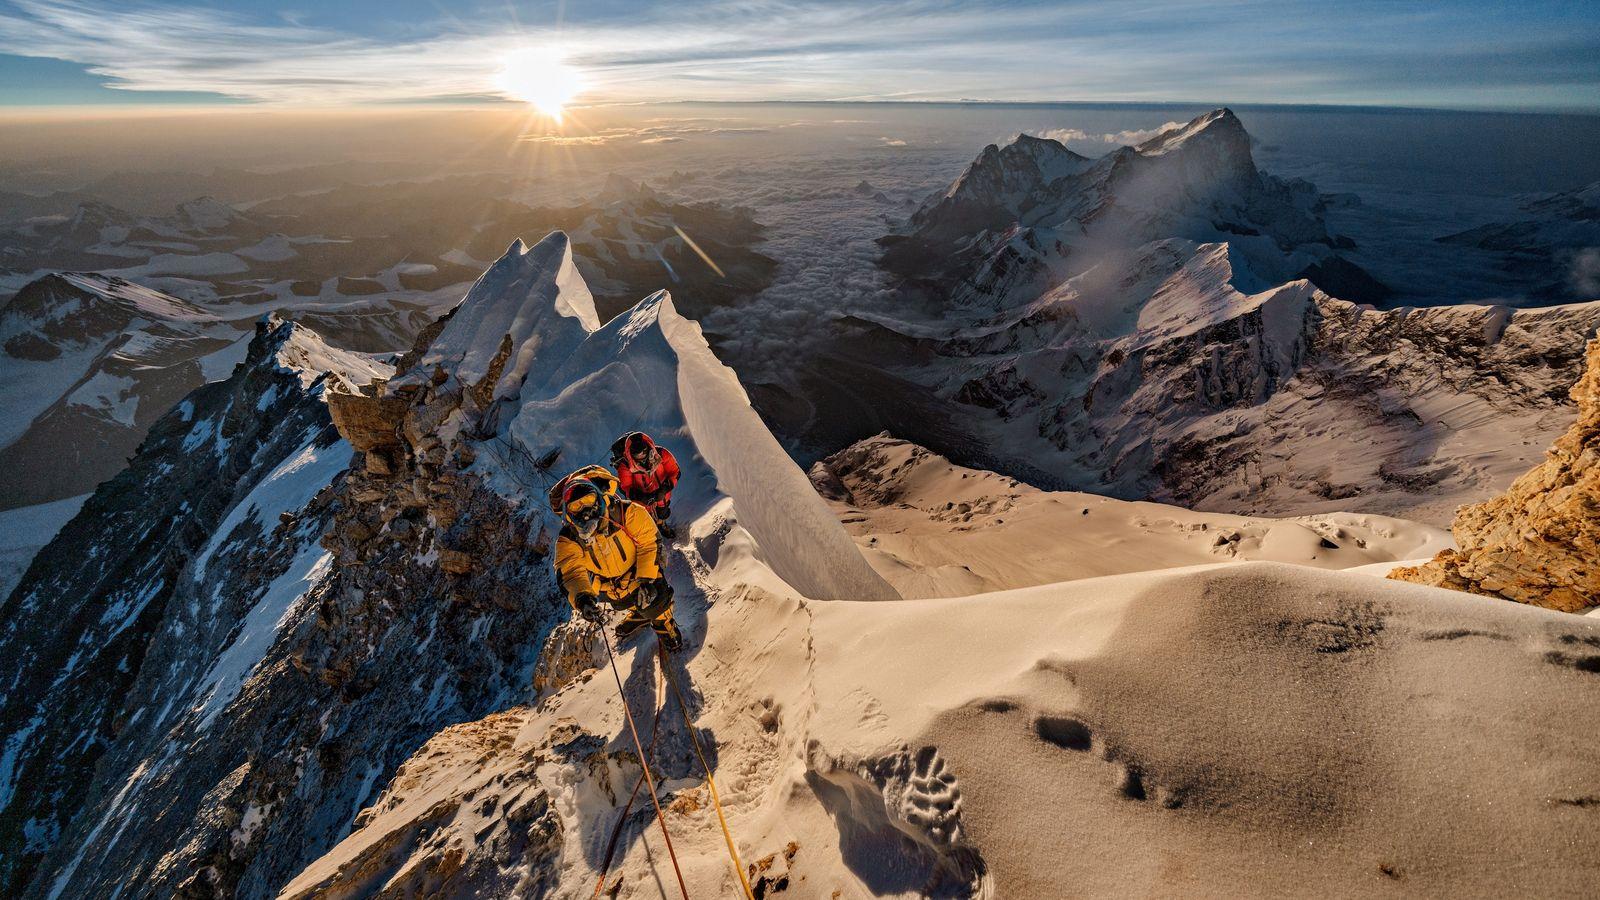 The sun illuminates the Tibetan plateau, shining its light on the northern flanks of Everest. The ...